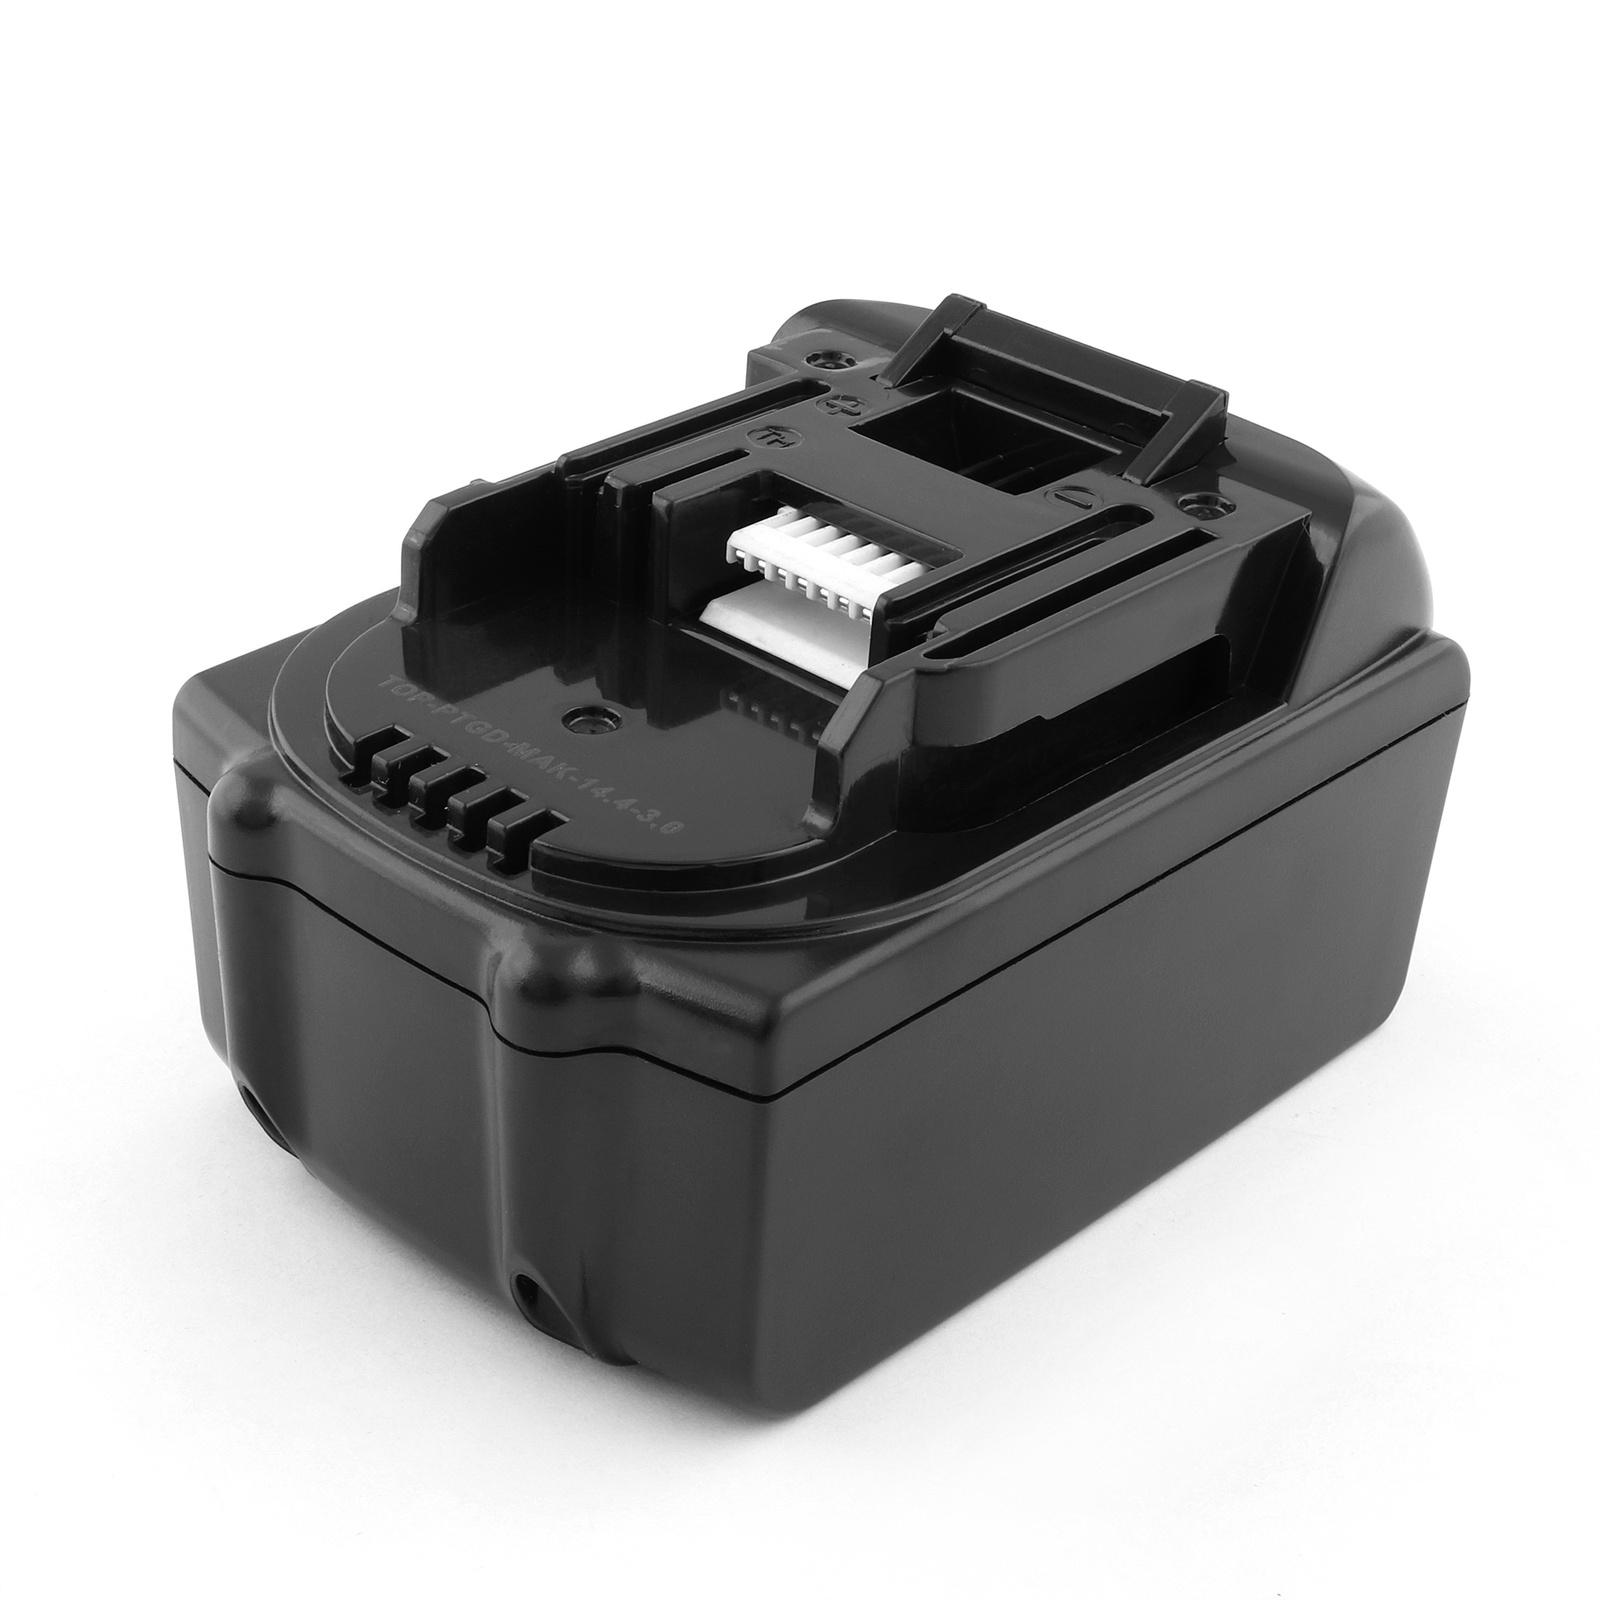 Аккумулятор для Makita 14.4V 3.0Ah (Li-Ion) PN: 194065-3, 194066-1, 194558-0.